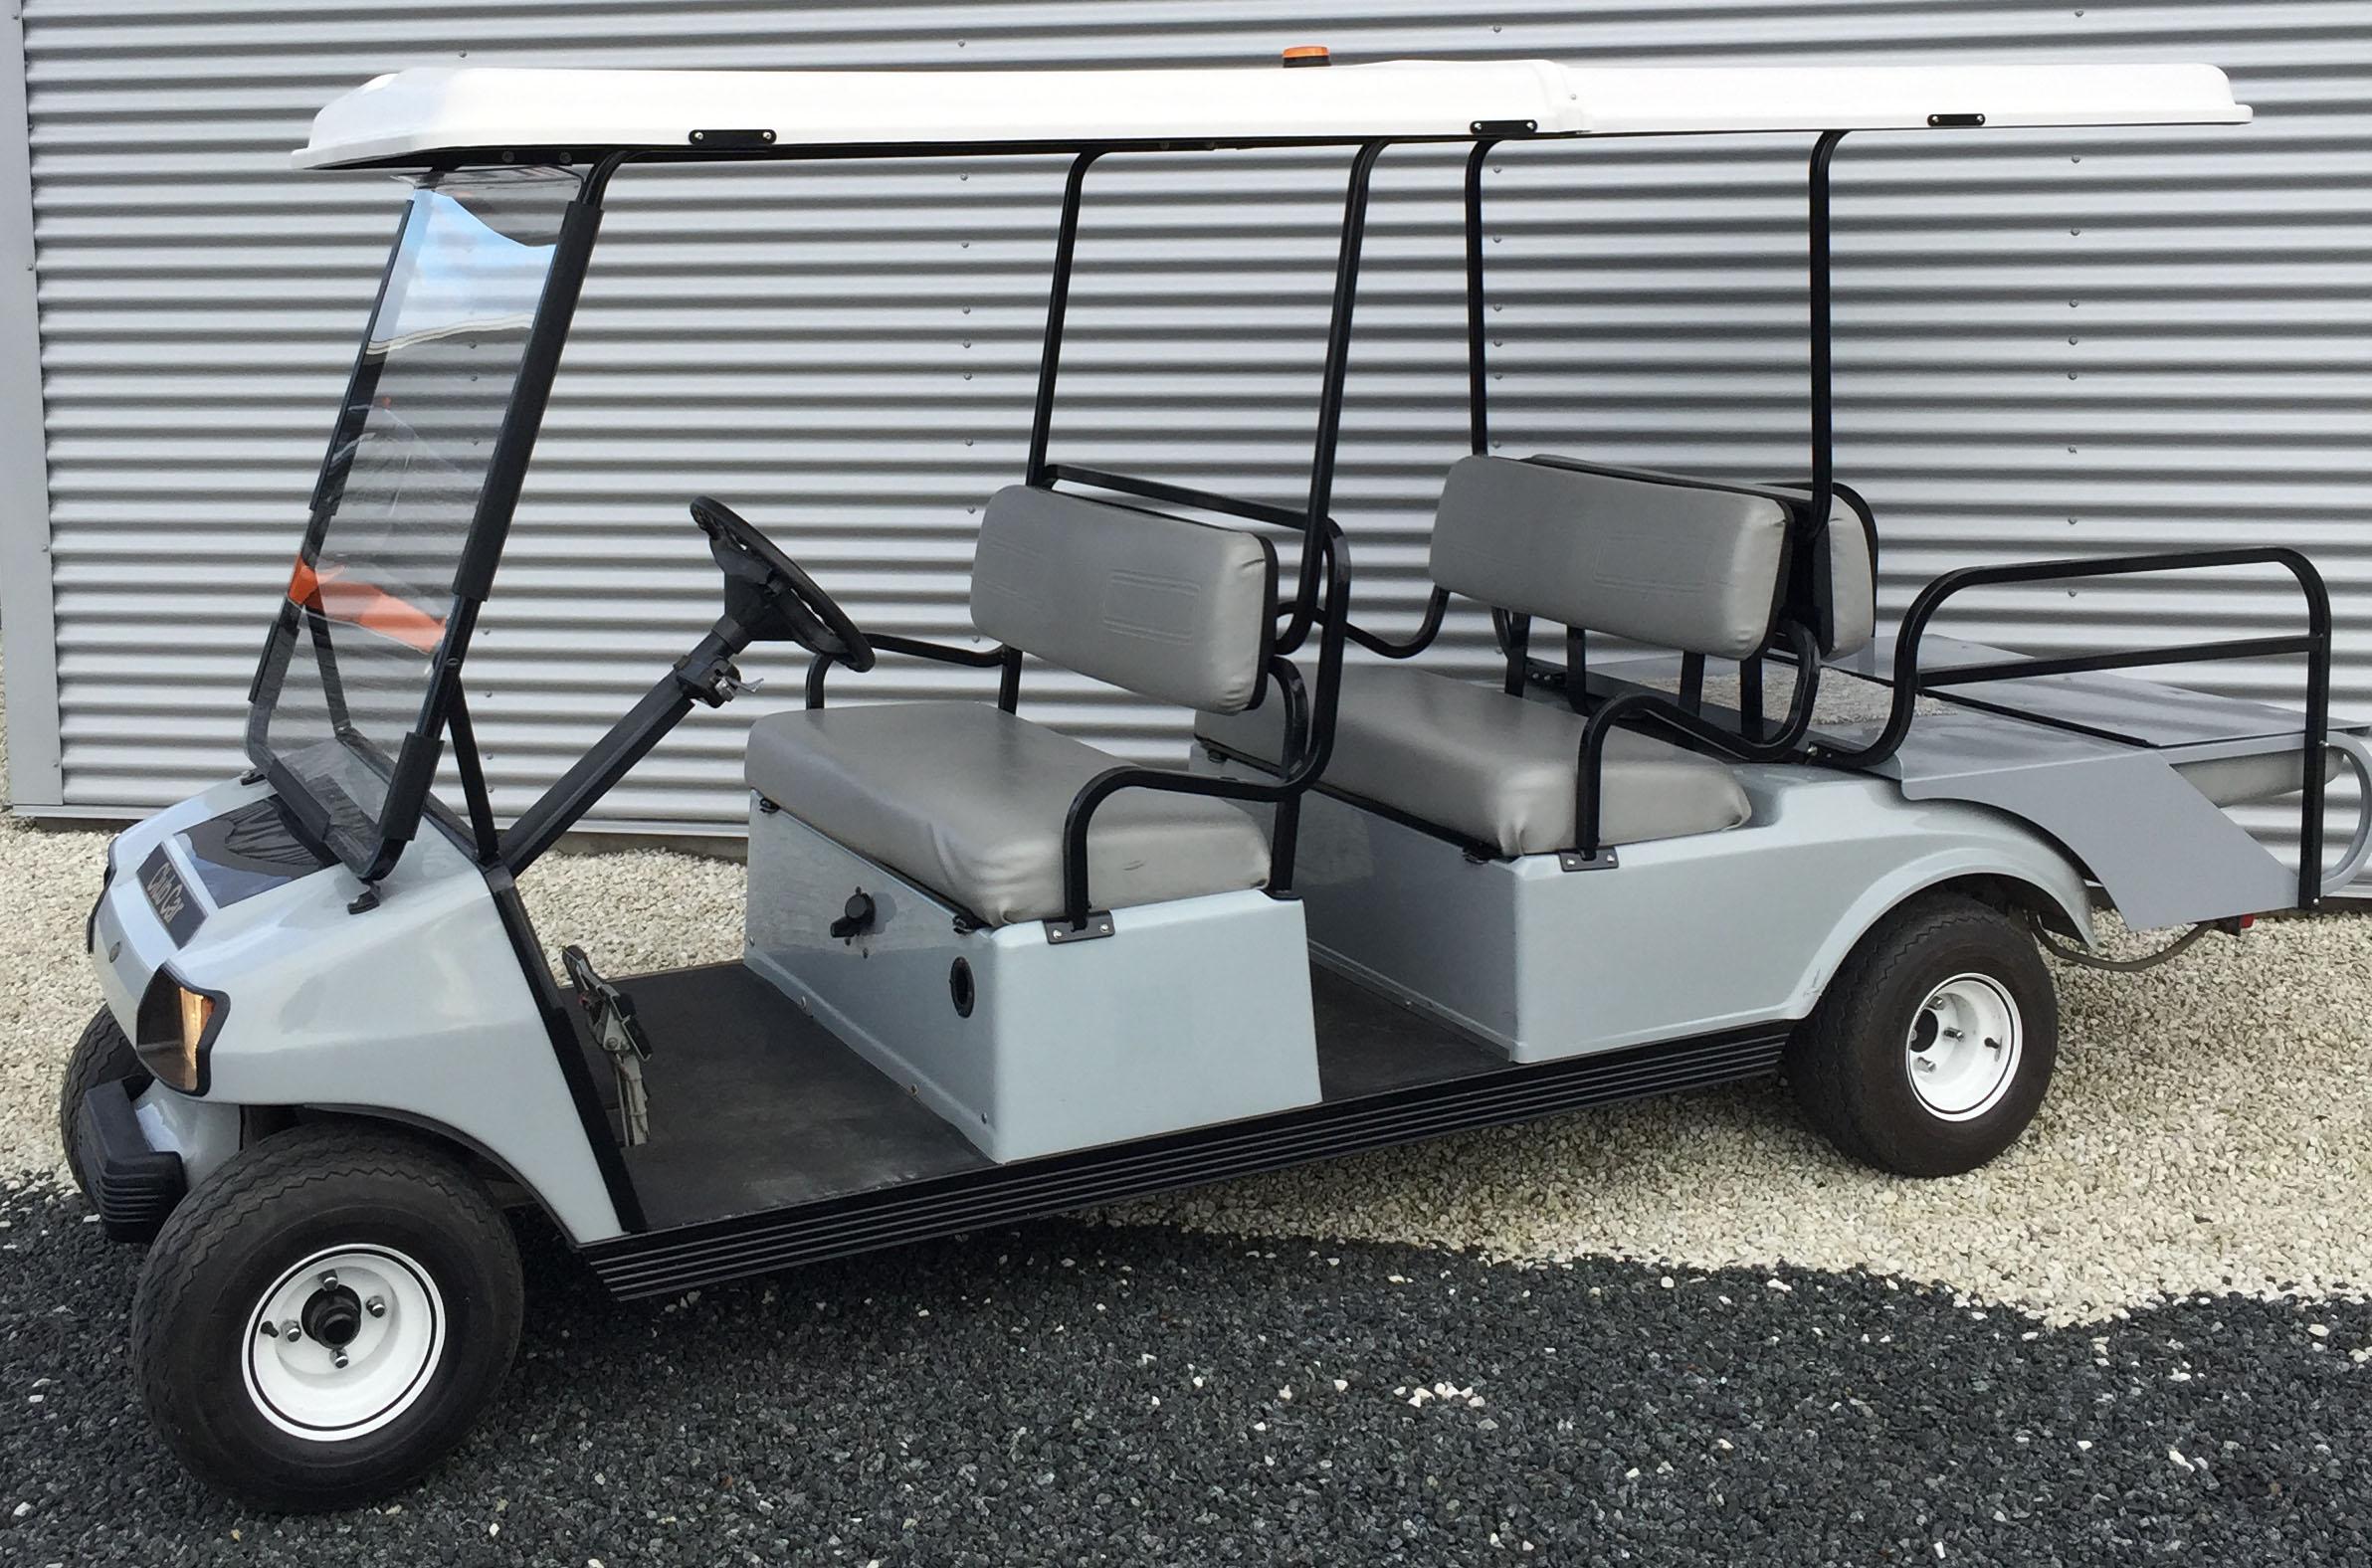 club car 6 seater muchbetter golf. Black Bedroom Furniture Sets. Home Design Ideas